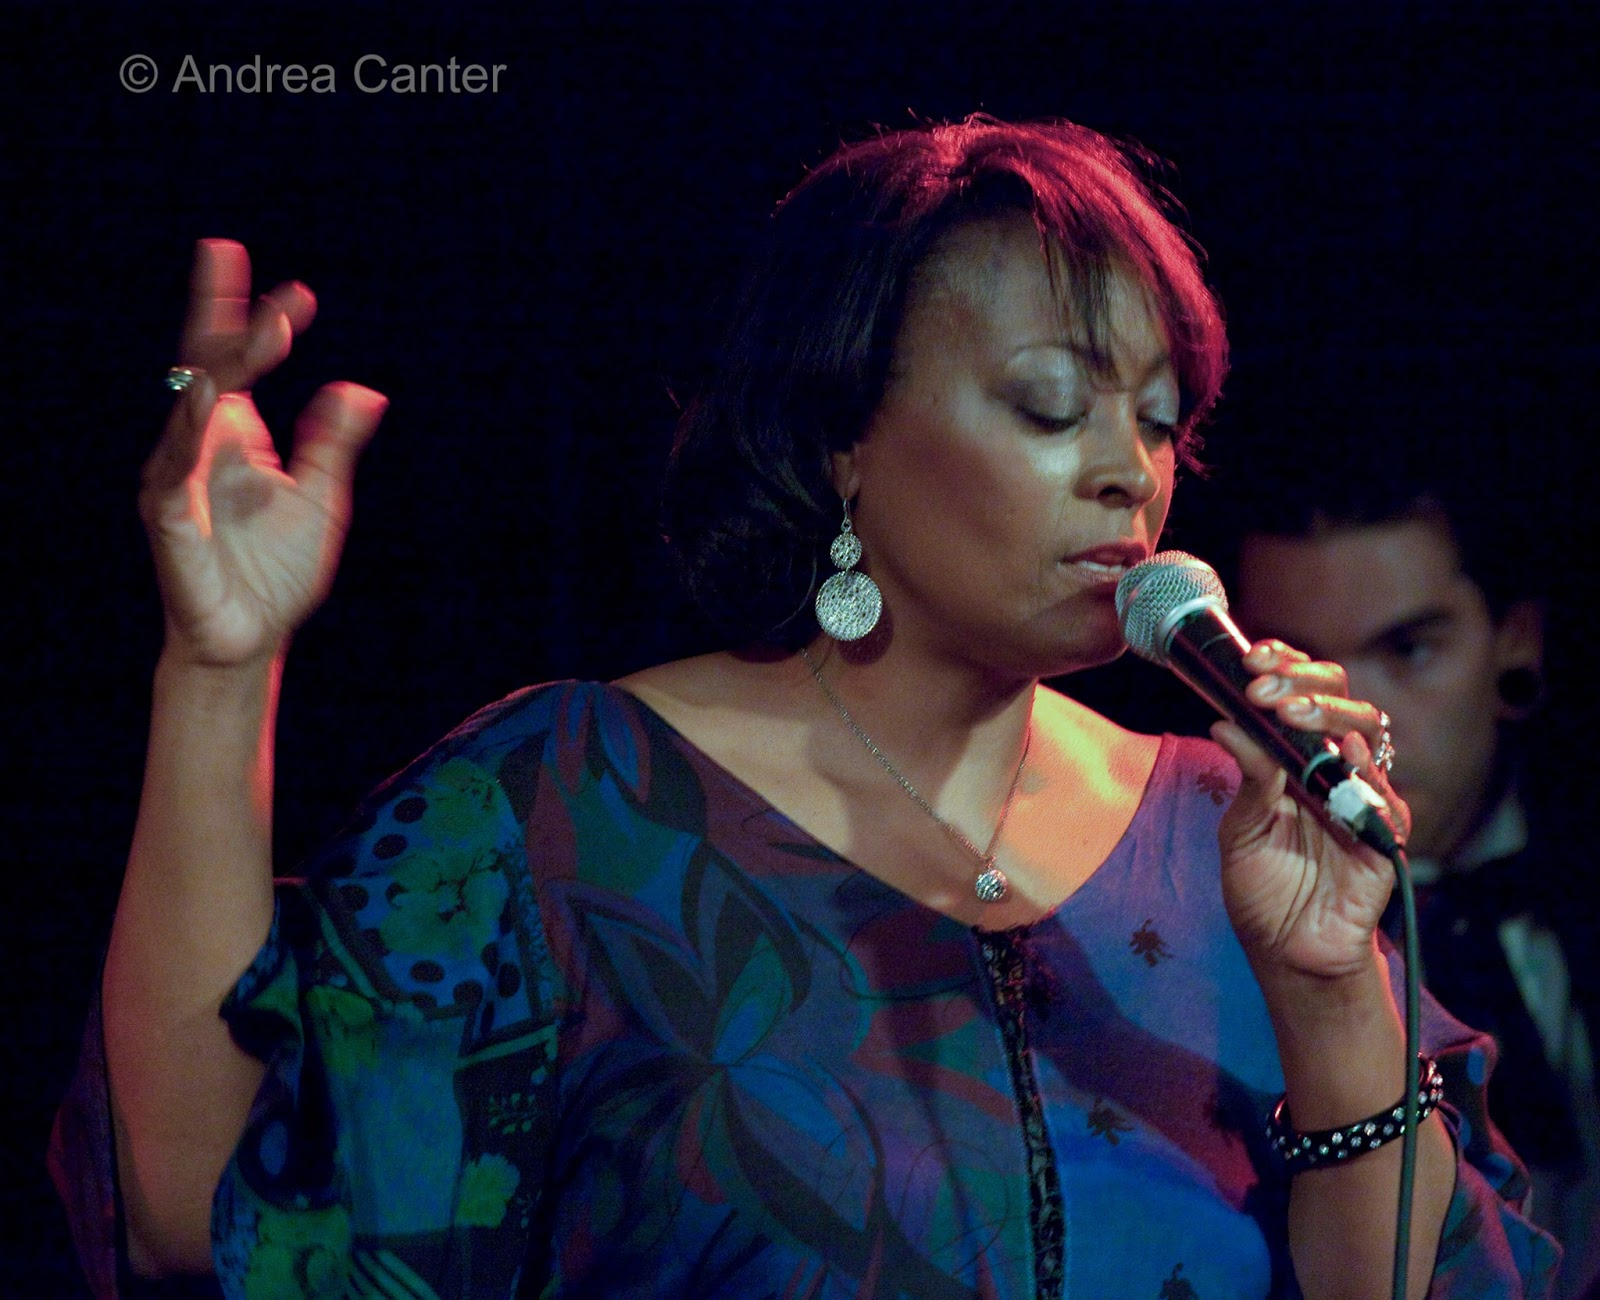 Vocalist Lila Ammons